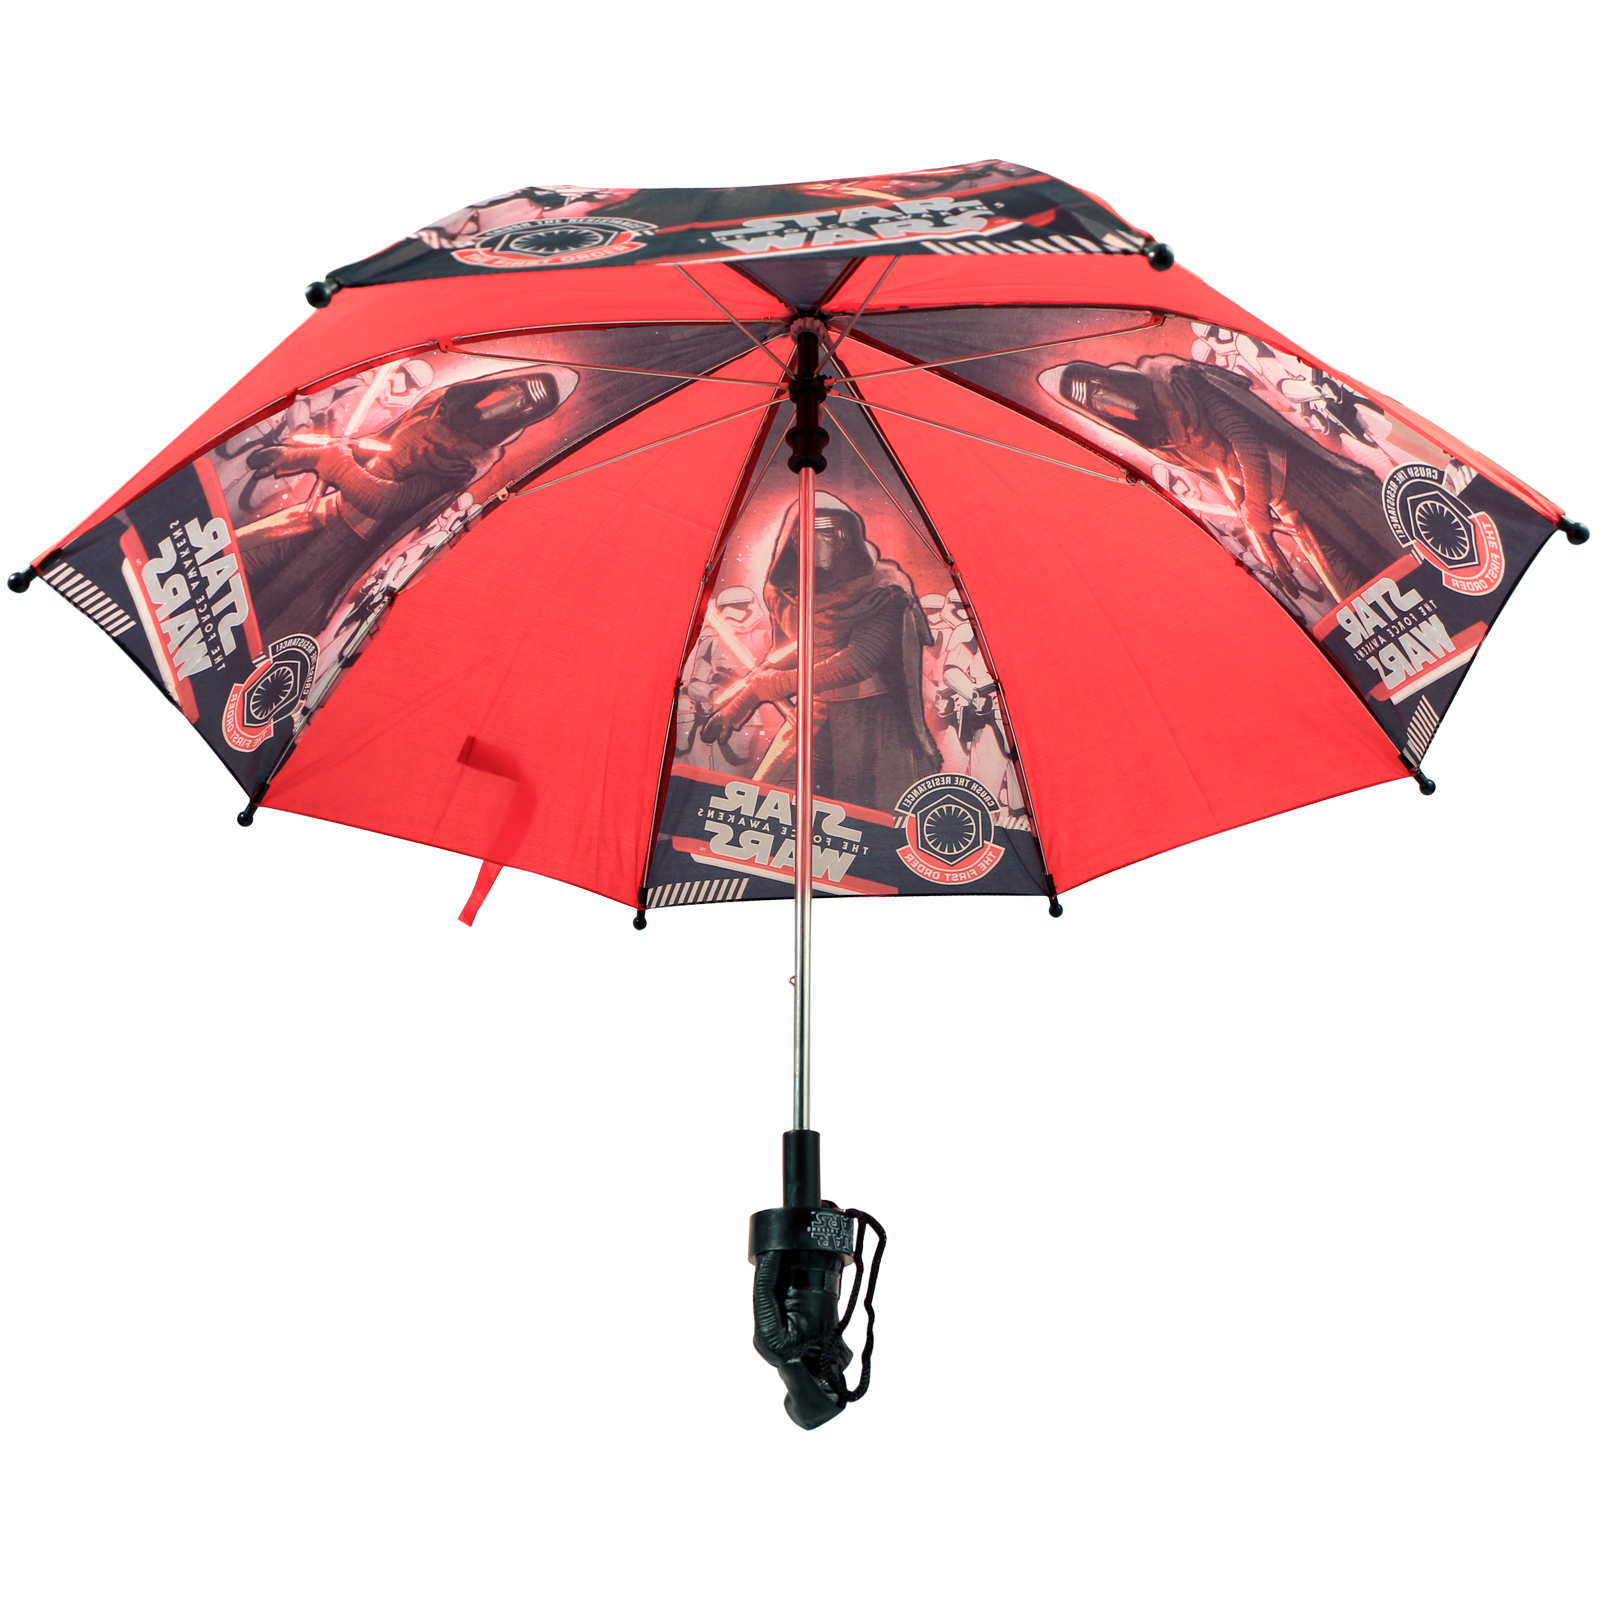 Star Wars Kids Rain Umbrella The Force Awakens Red